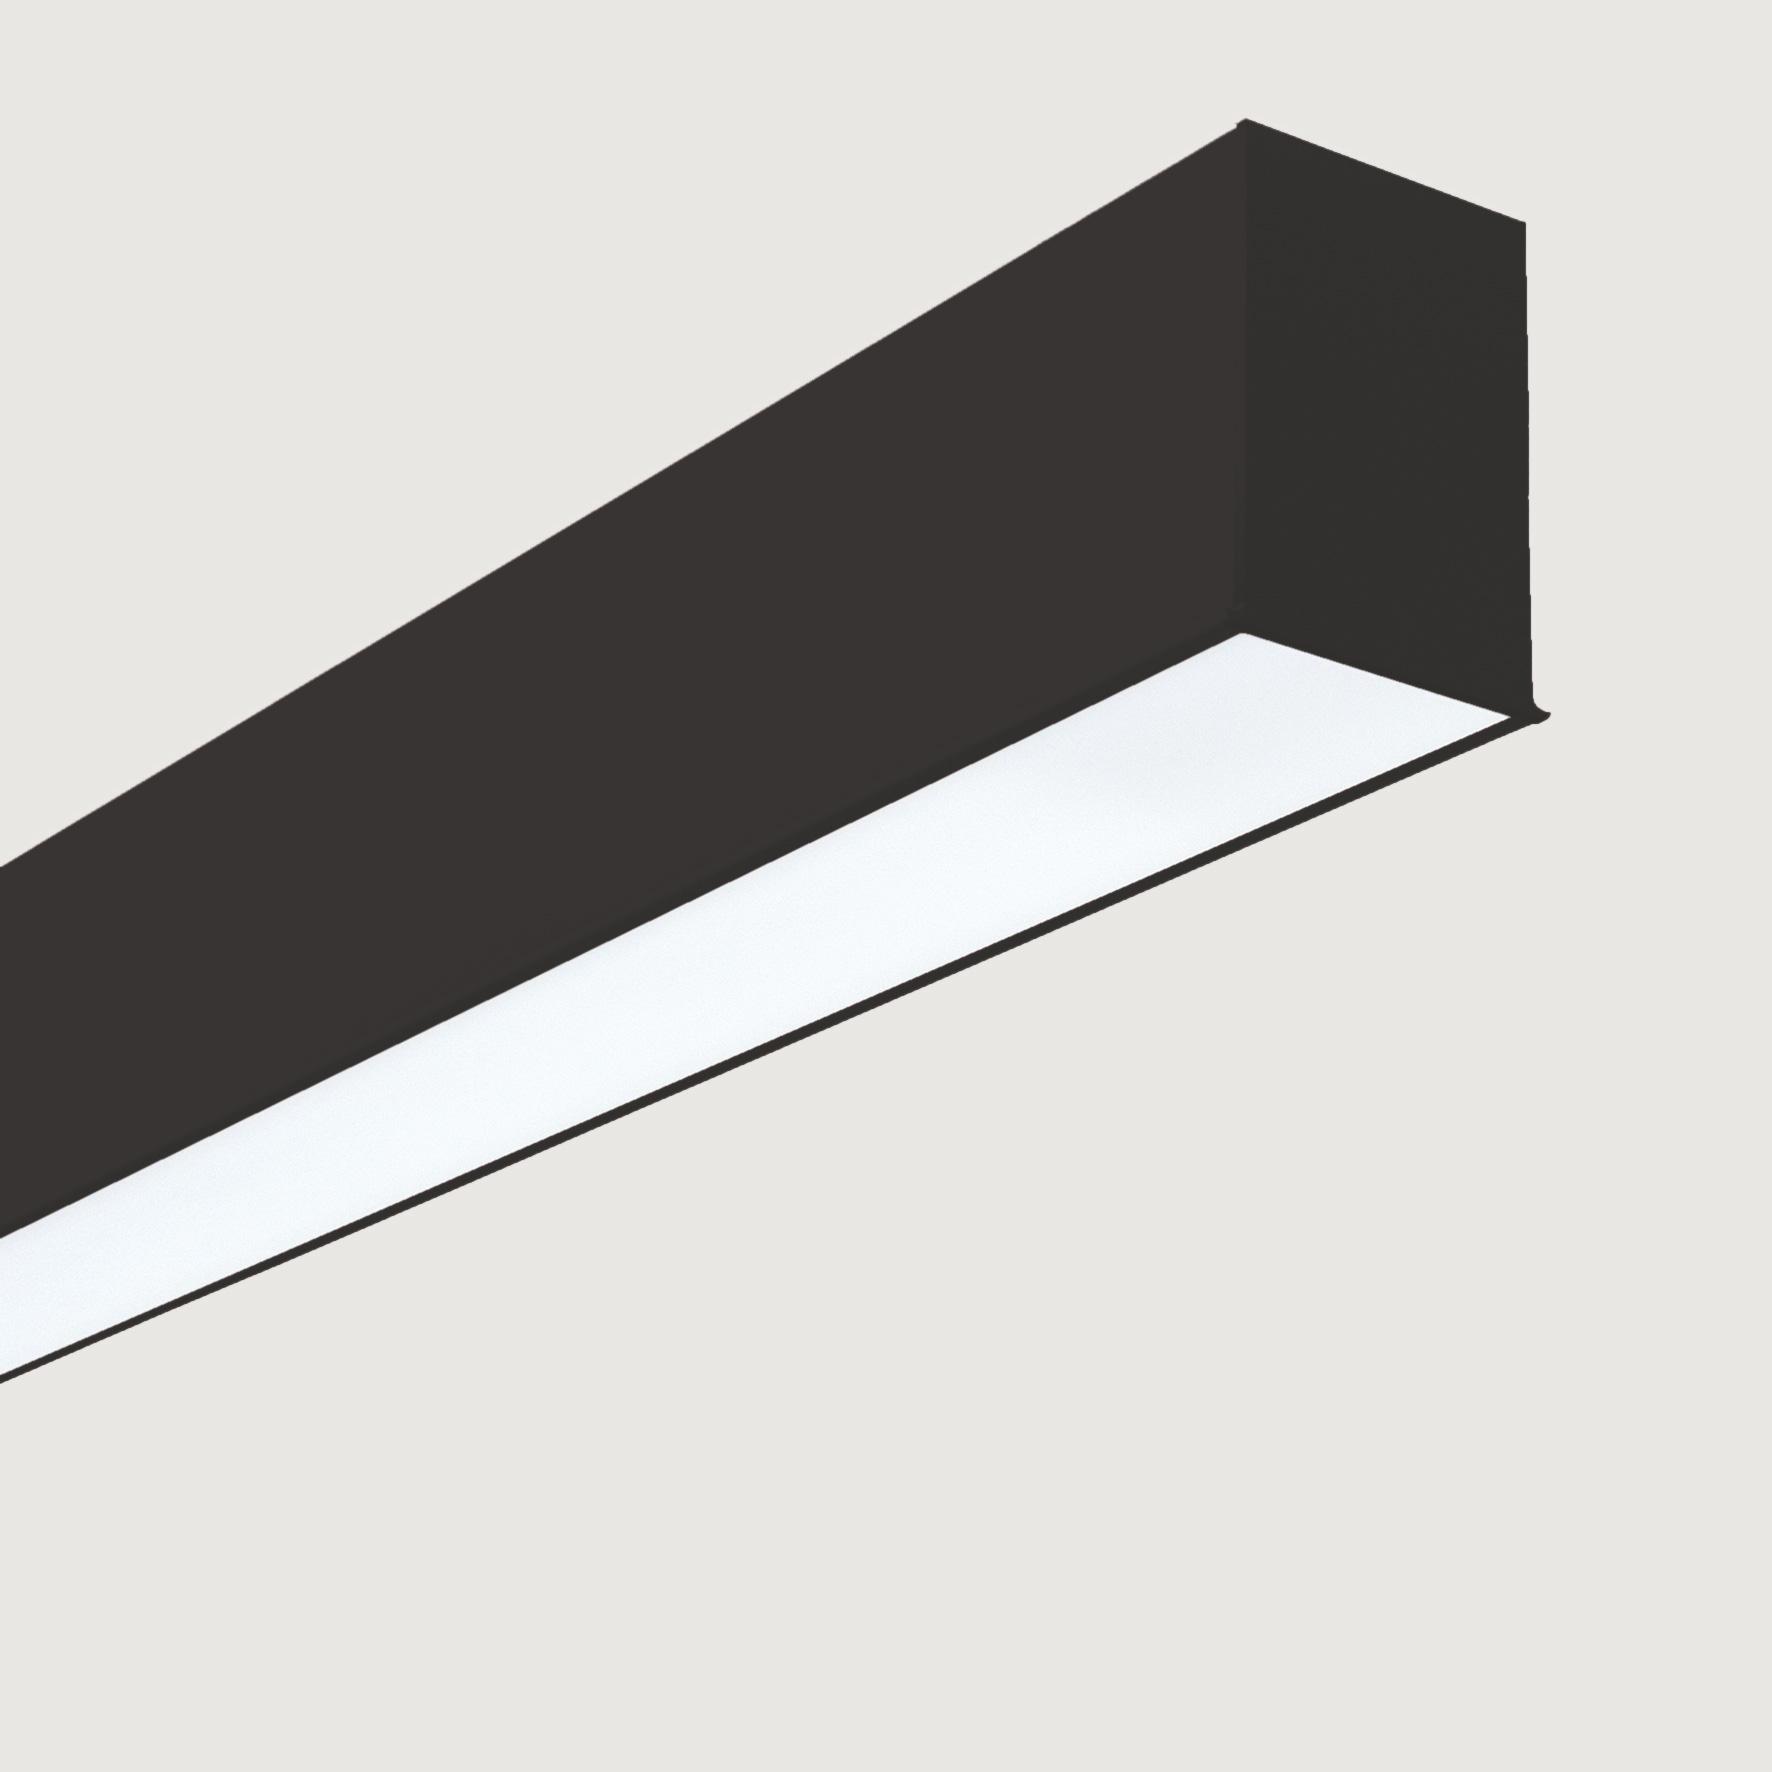 linem-sa57-profilleuchte-schwarz-sml-led